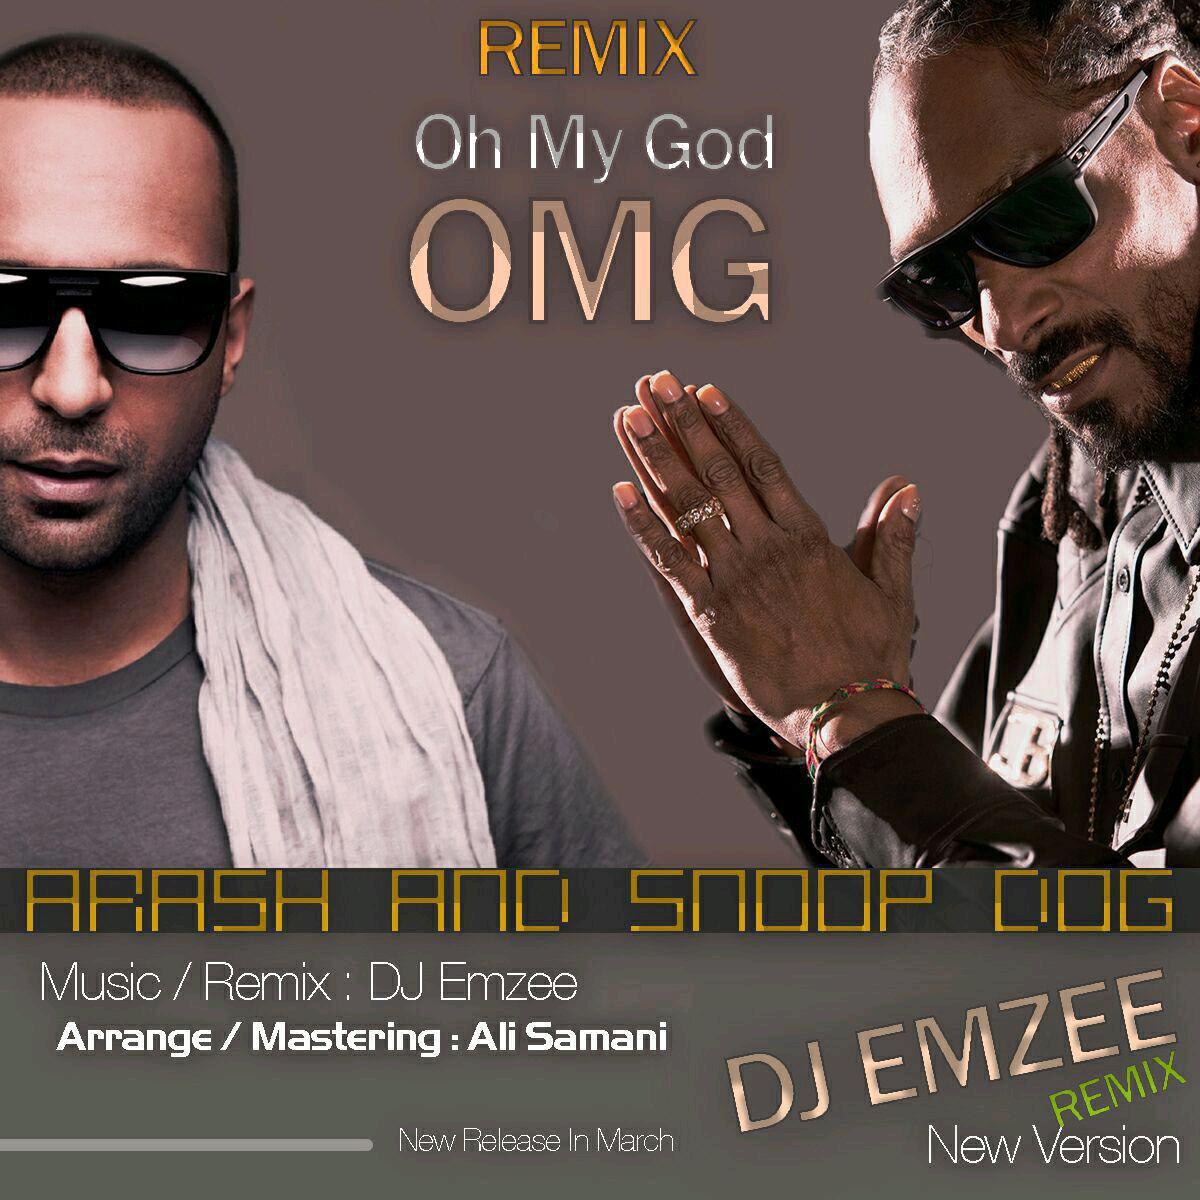 Arash Ft. Snoop Dog – OMG – (DJ Emzee Remix)